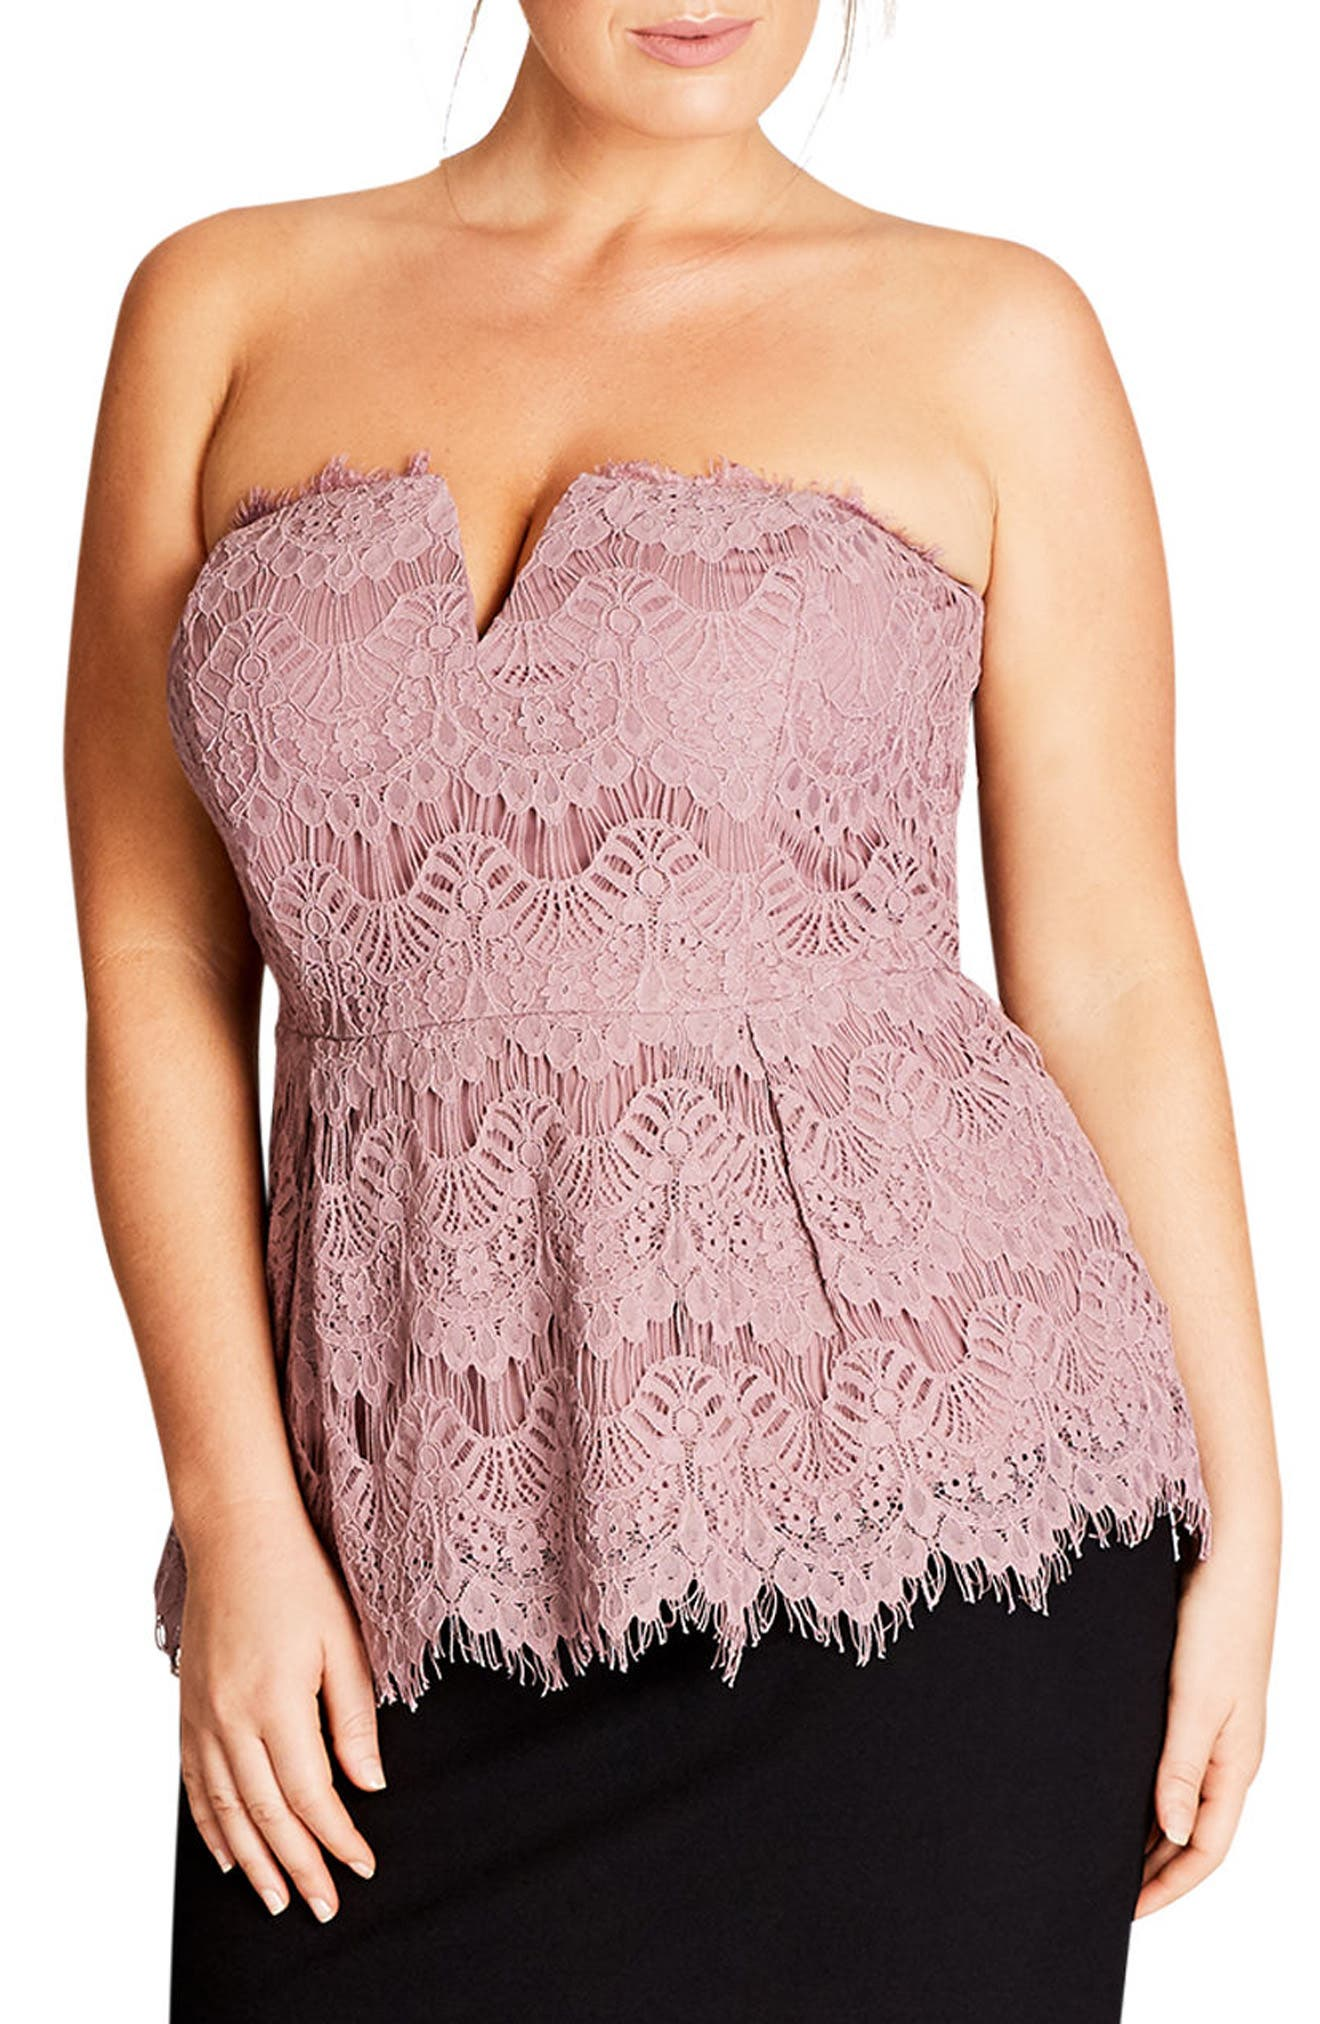 City Chic Deep V Strapless Lace Corset Top (Plus Size)